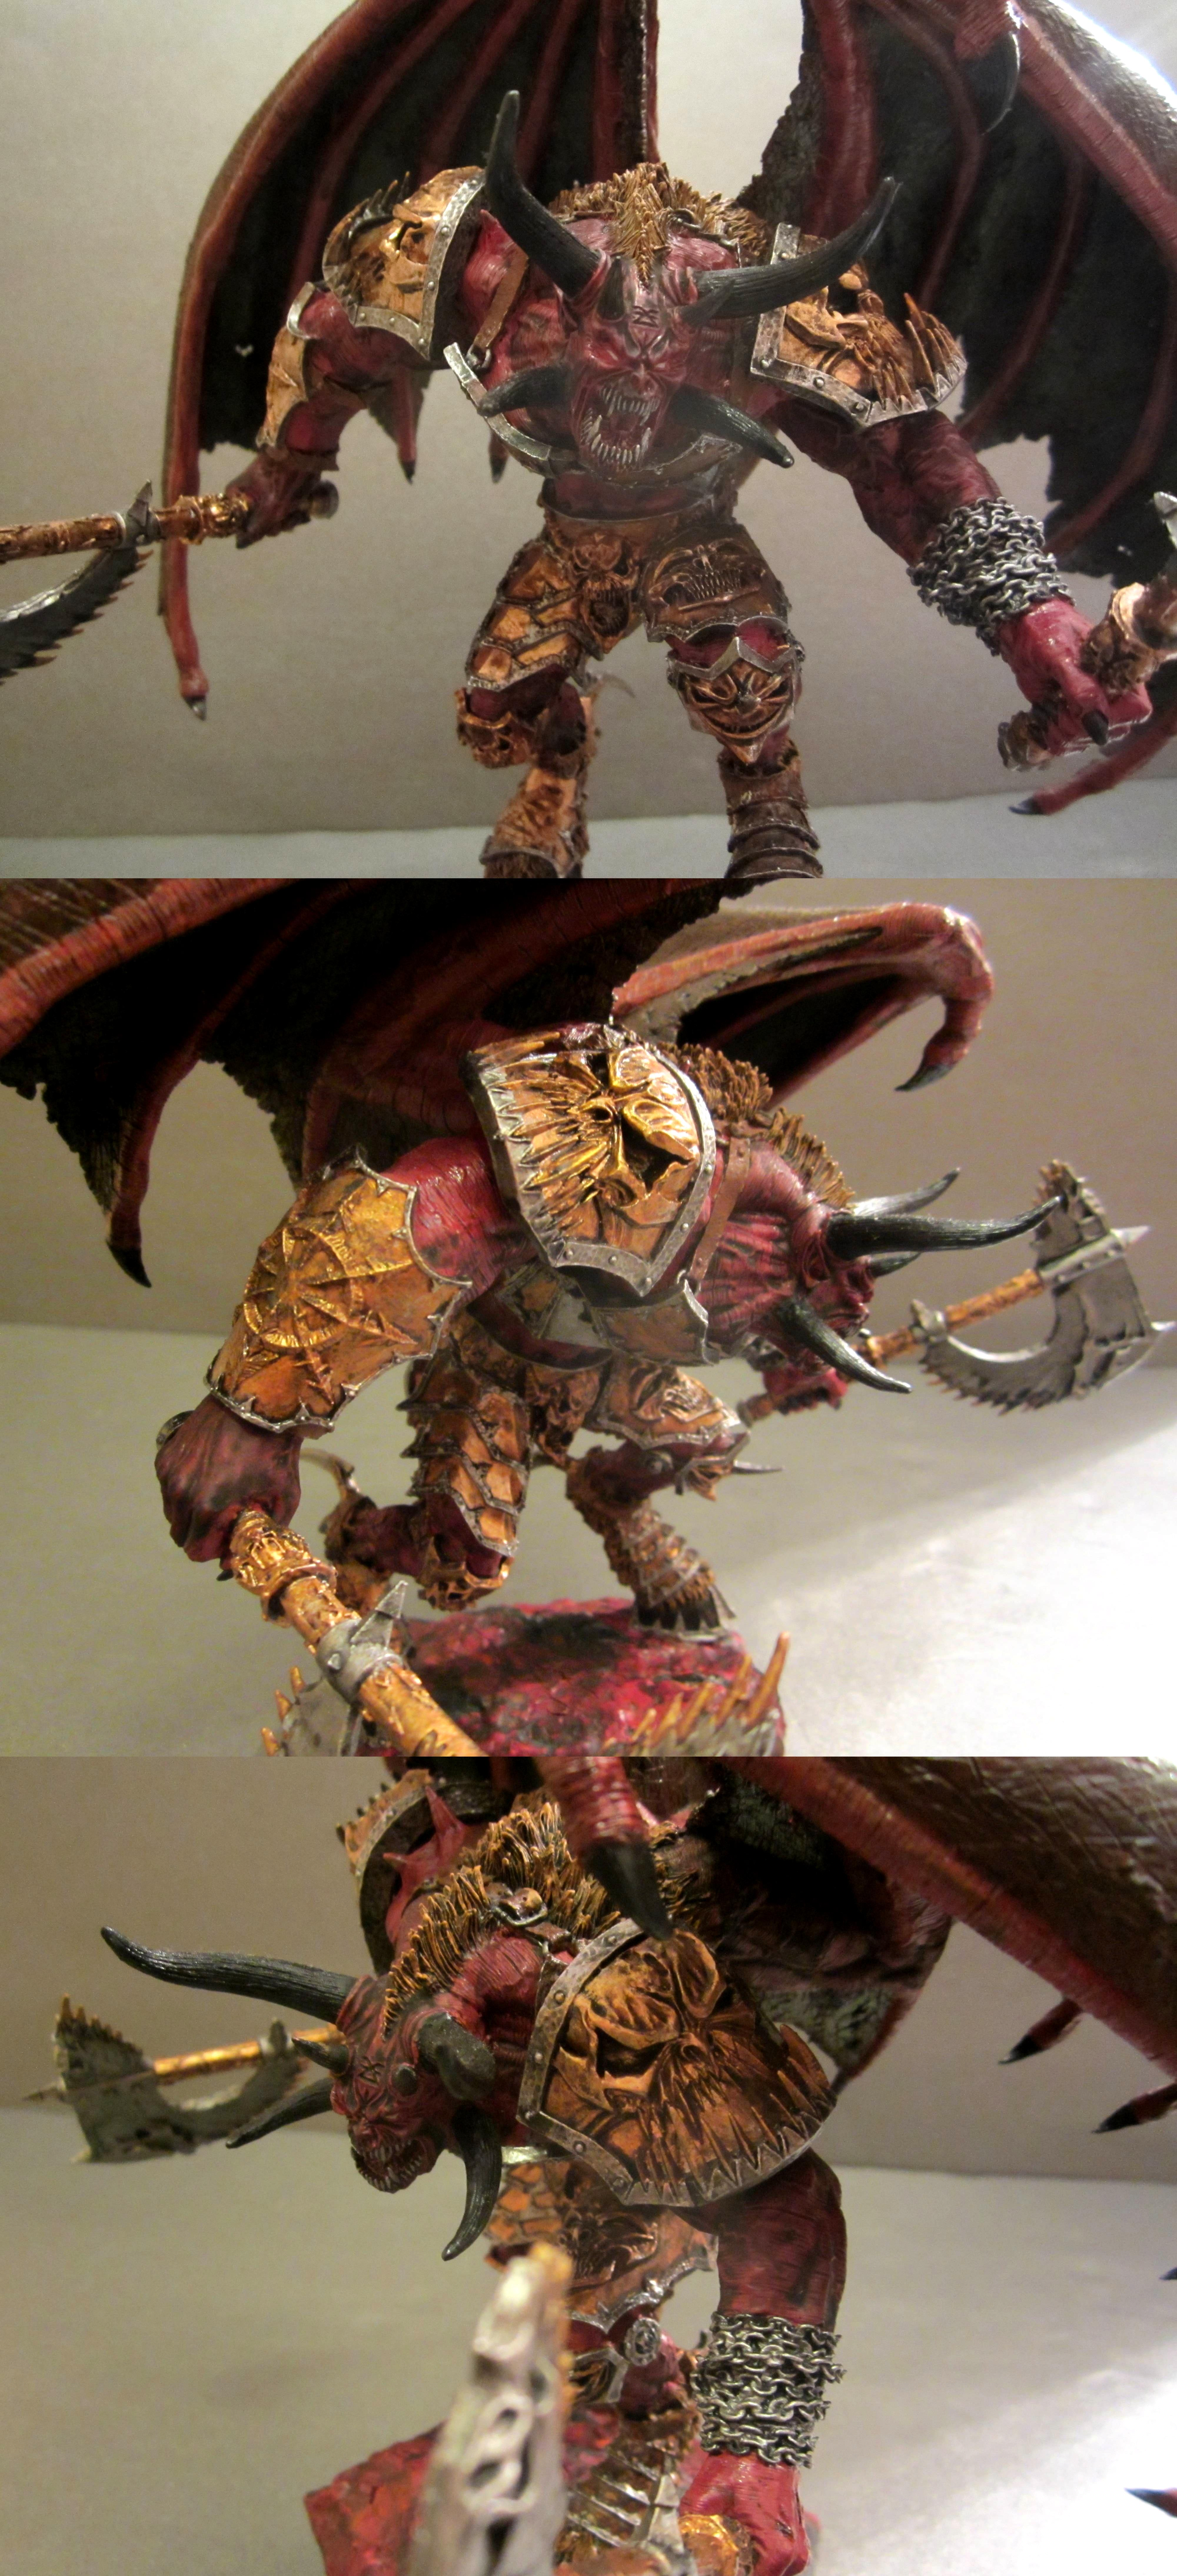 An'ggrath, Bloodthirster, Chaos, Chaos Space Marines, Daemonic, Daemons, Incursion, Ka'jagga'nath, Khorne, Lord, Skarbrand, Warhammer 40,000